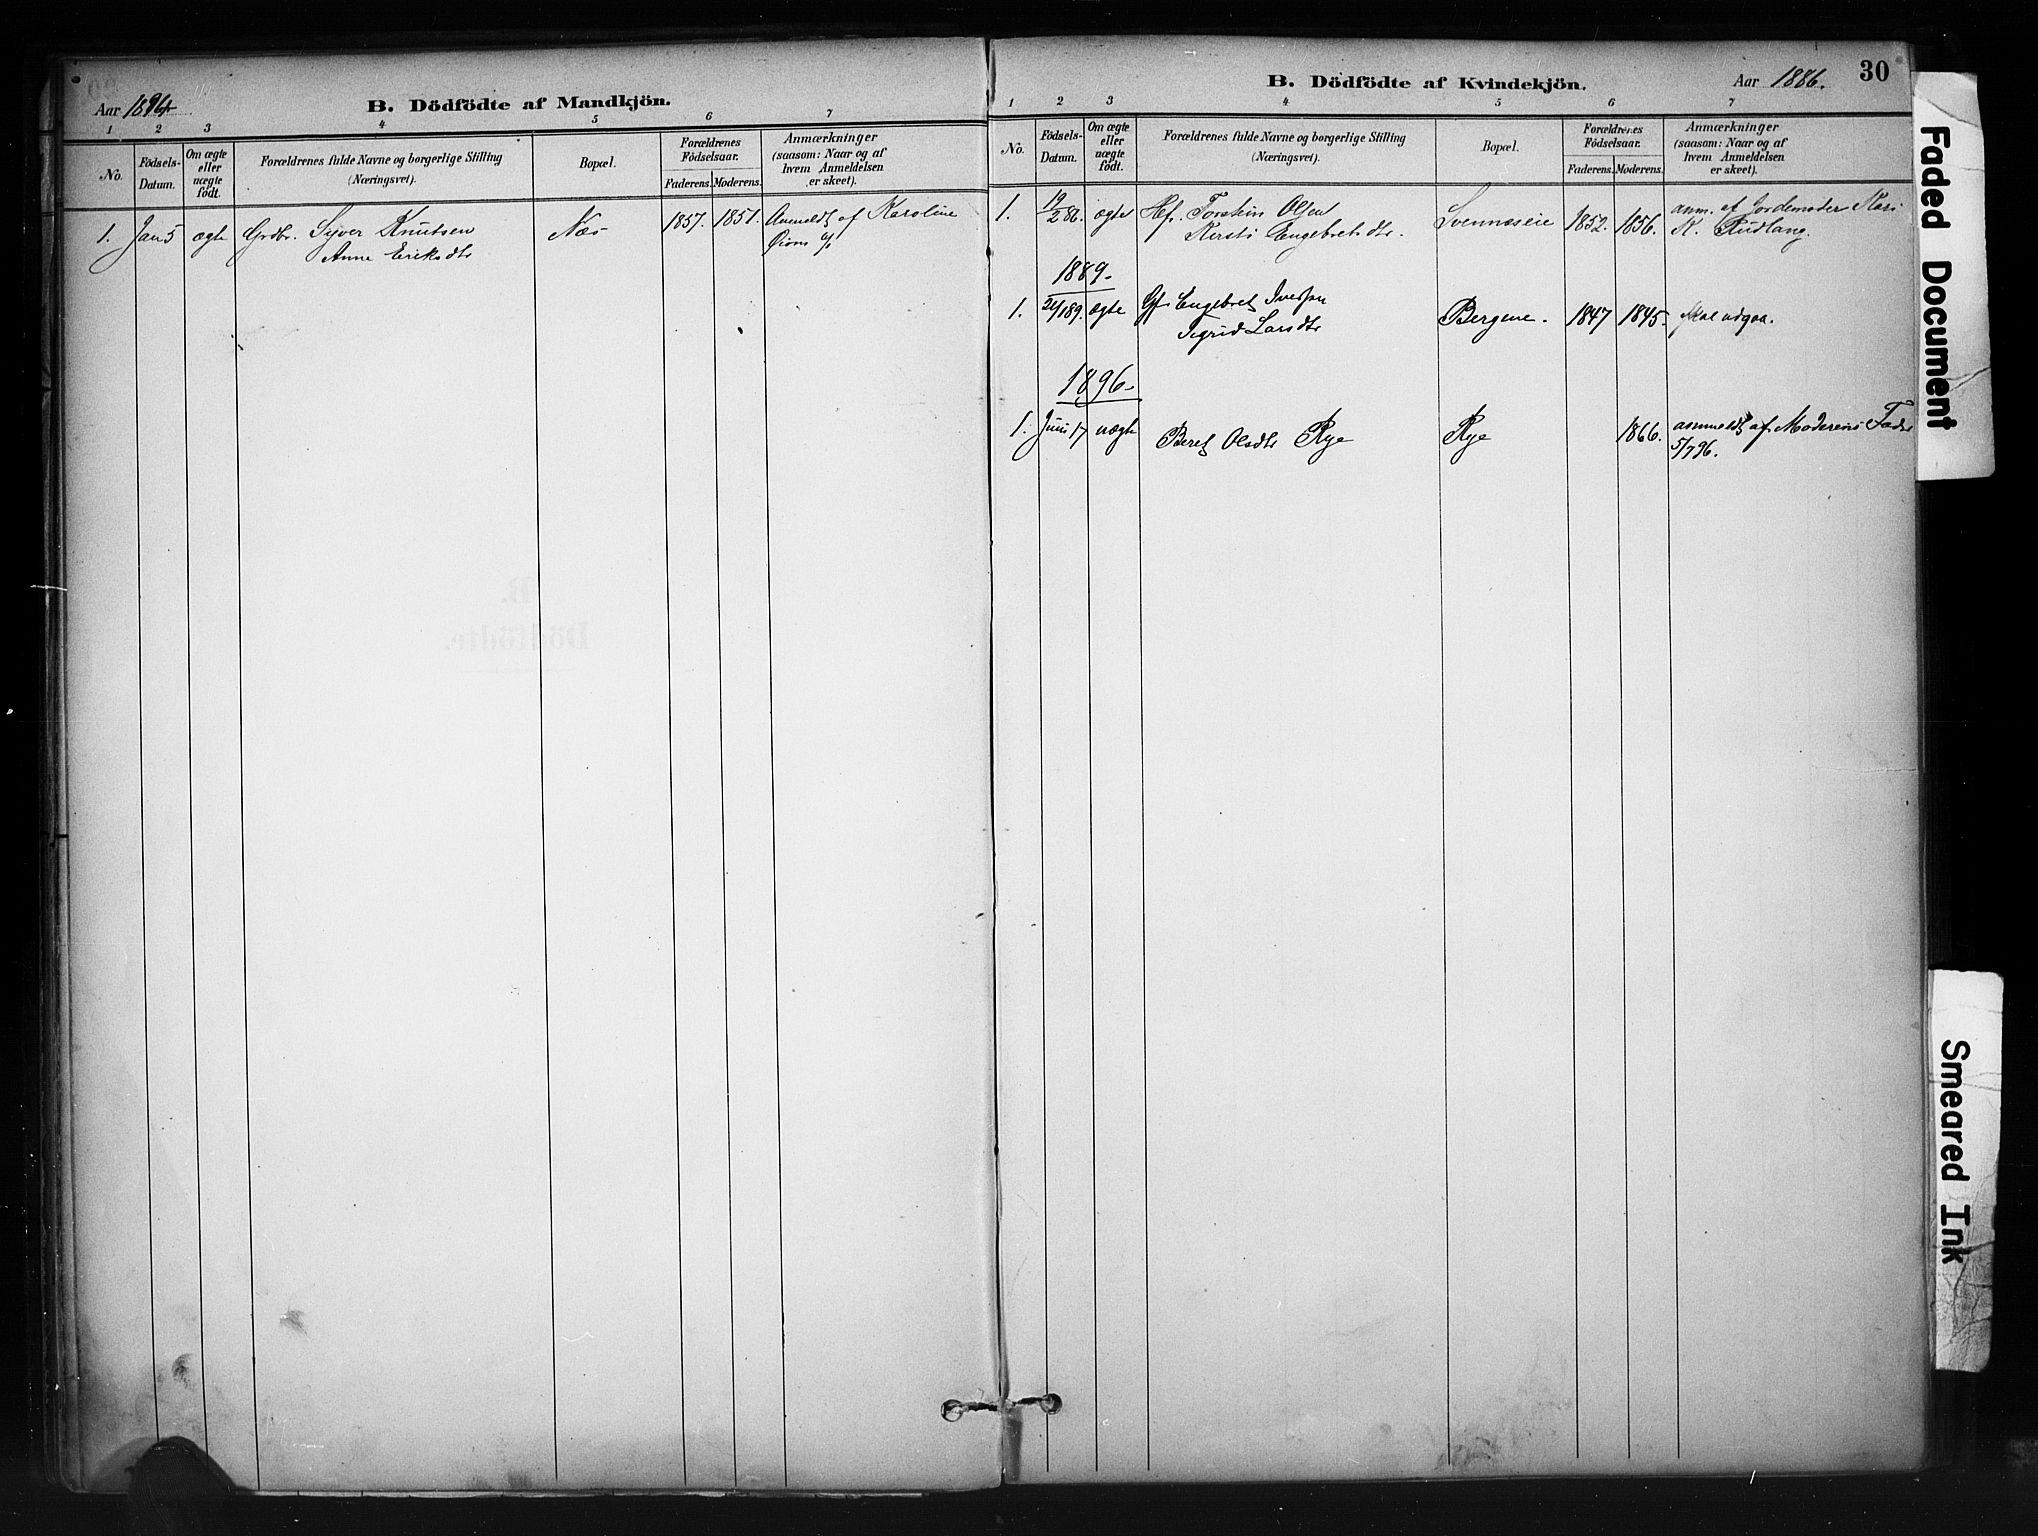 SAH, Nord-Aurdal prestekontor, Ministerialbok nr. 10, 1883-1896, s. 30